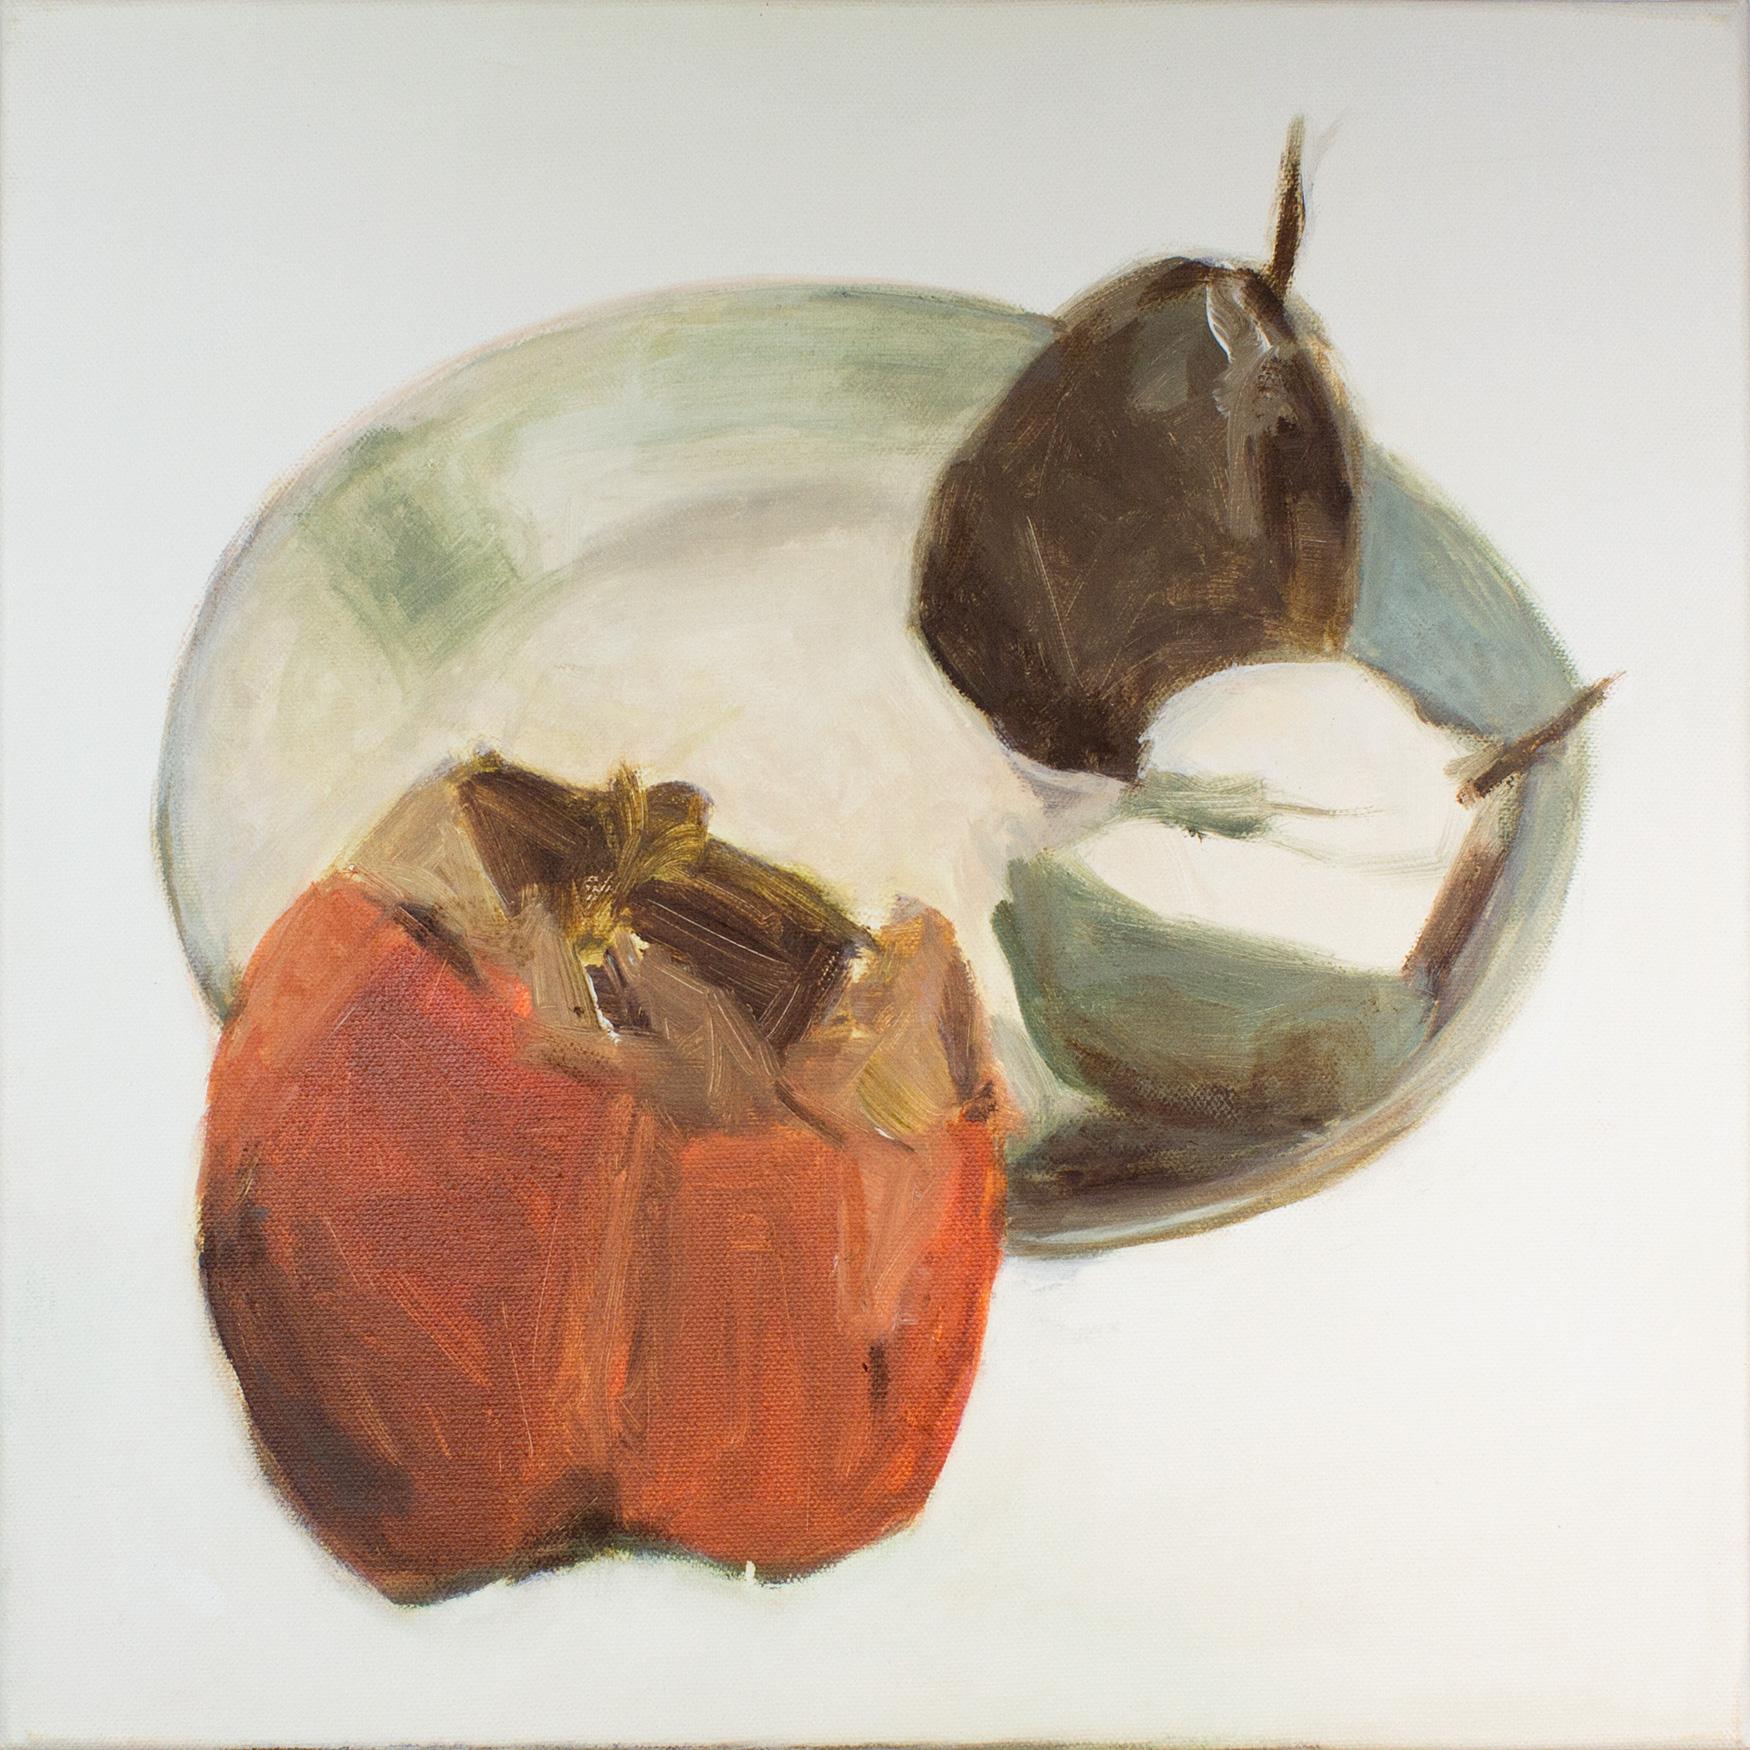 ohne Titel, 2009 Acryl, Leinwand 40 x 40 cm